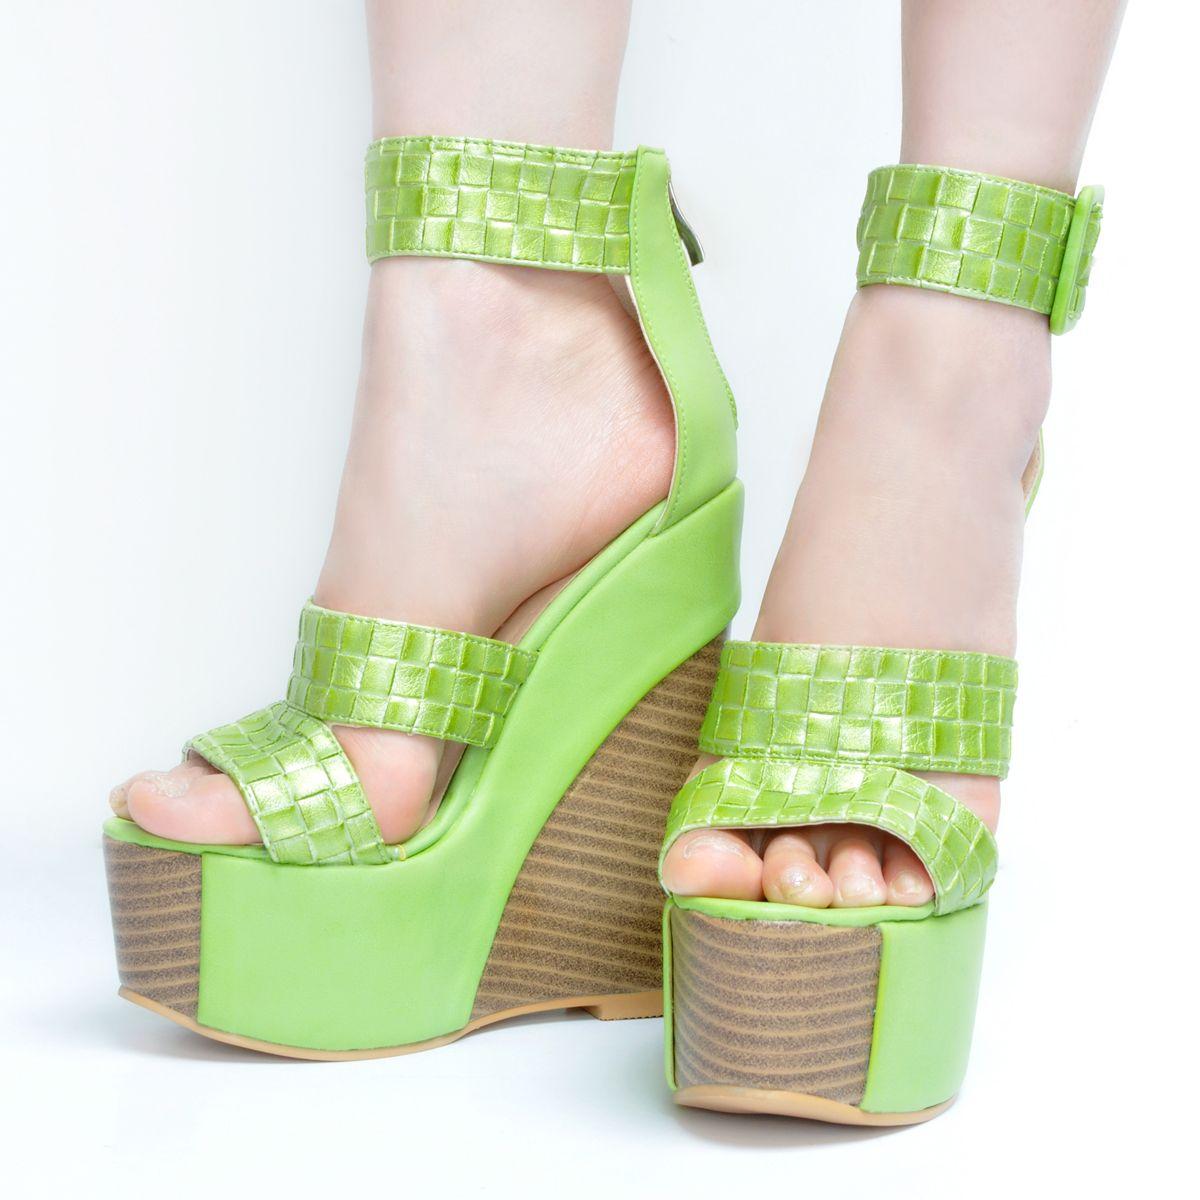 Legzen Fashion Women's Sandals Wedge Open Toe Platform Высокие каблуки Сандалии Коричневые зеленые ботинки для женщин плюс размер